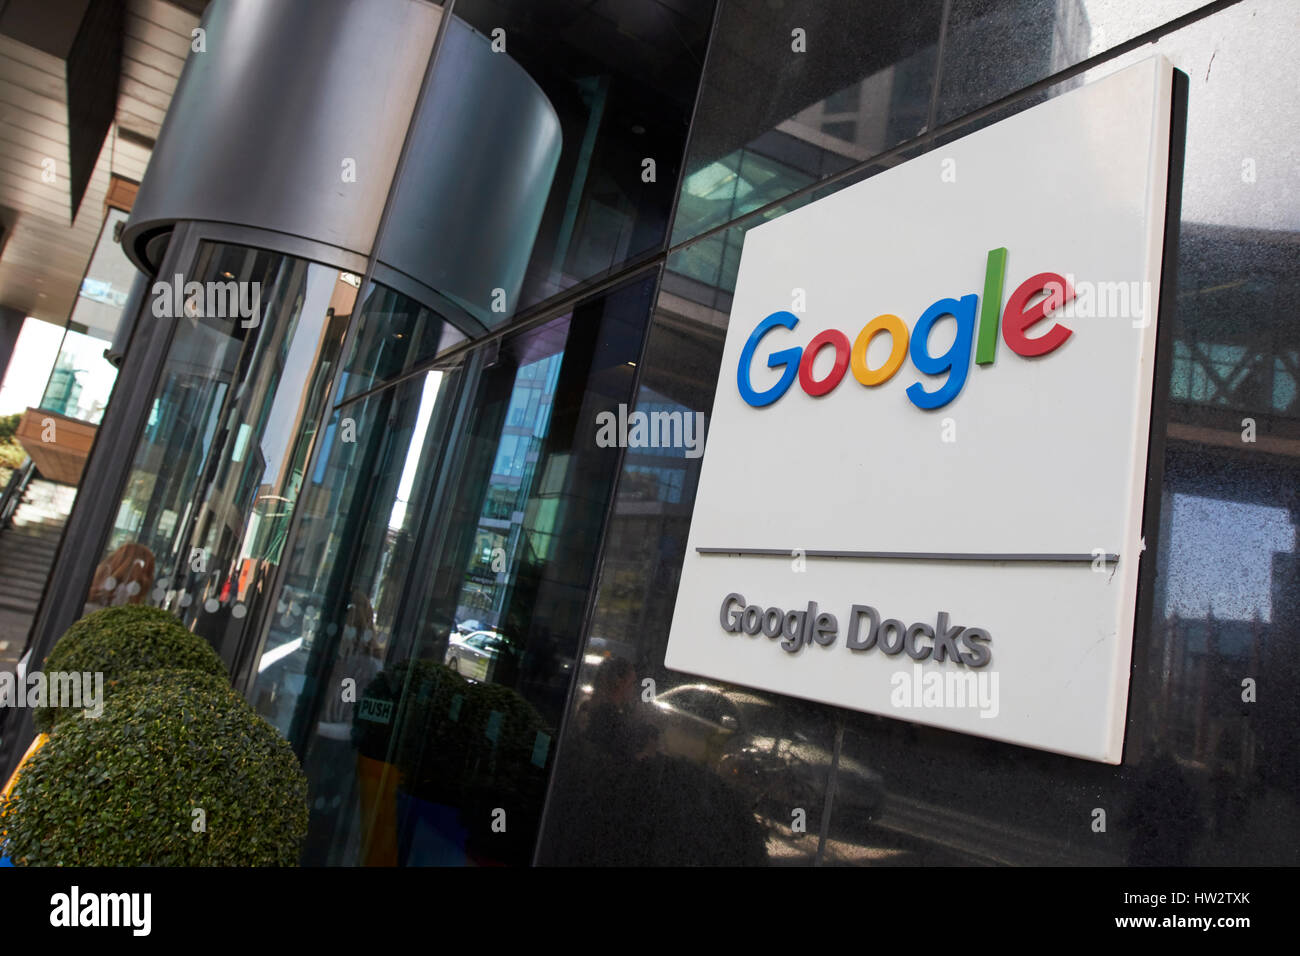 Google Docks Stockfotos & Google Docks Bilder - Alamy